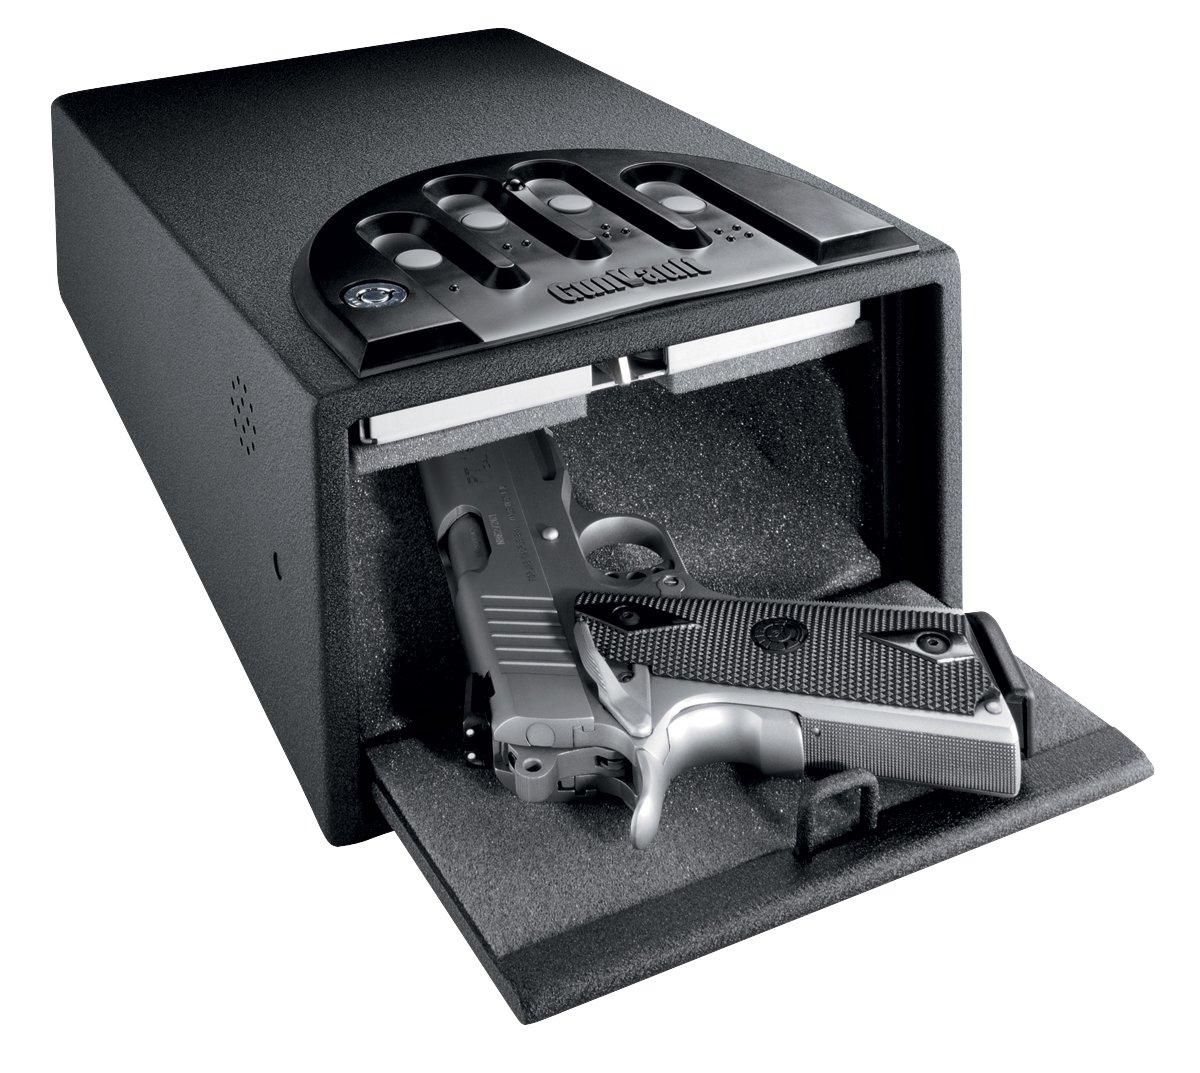 Gunvault GV1000S Mini Vault Standard Gun Safe at Sears.com